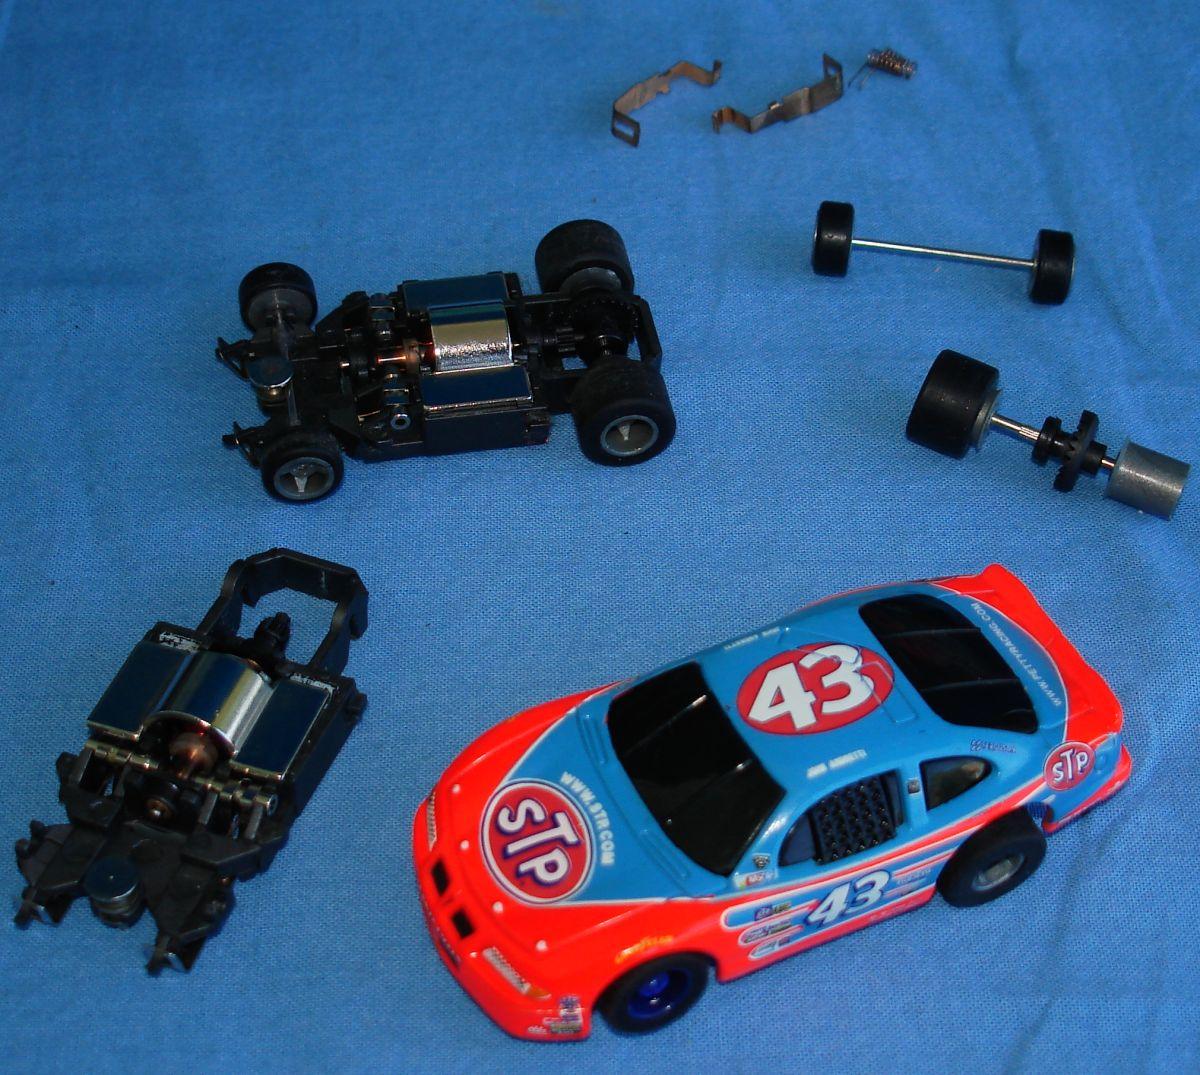 Richard Petty For Sale: LIFE LIKE ELECTRIC RACING NASCAR 500 RICHARD PETTY STP #43